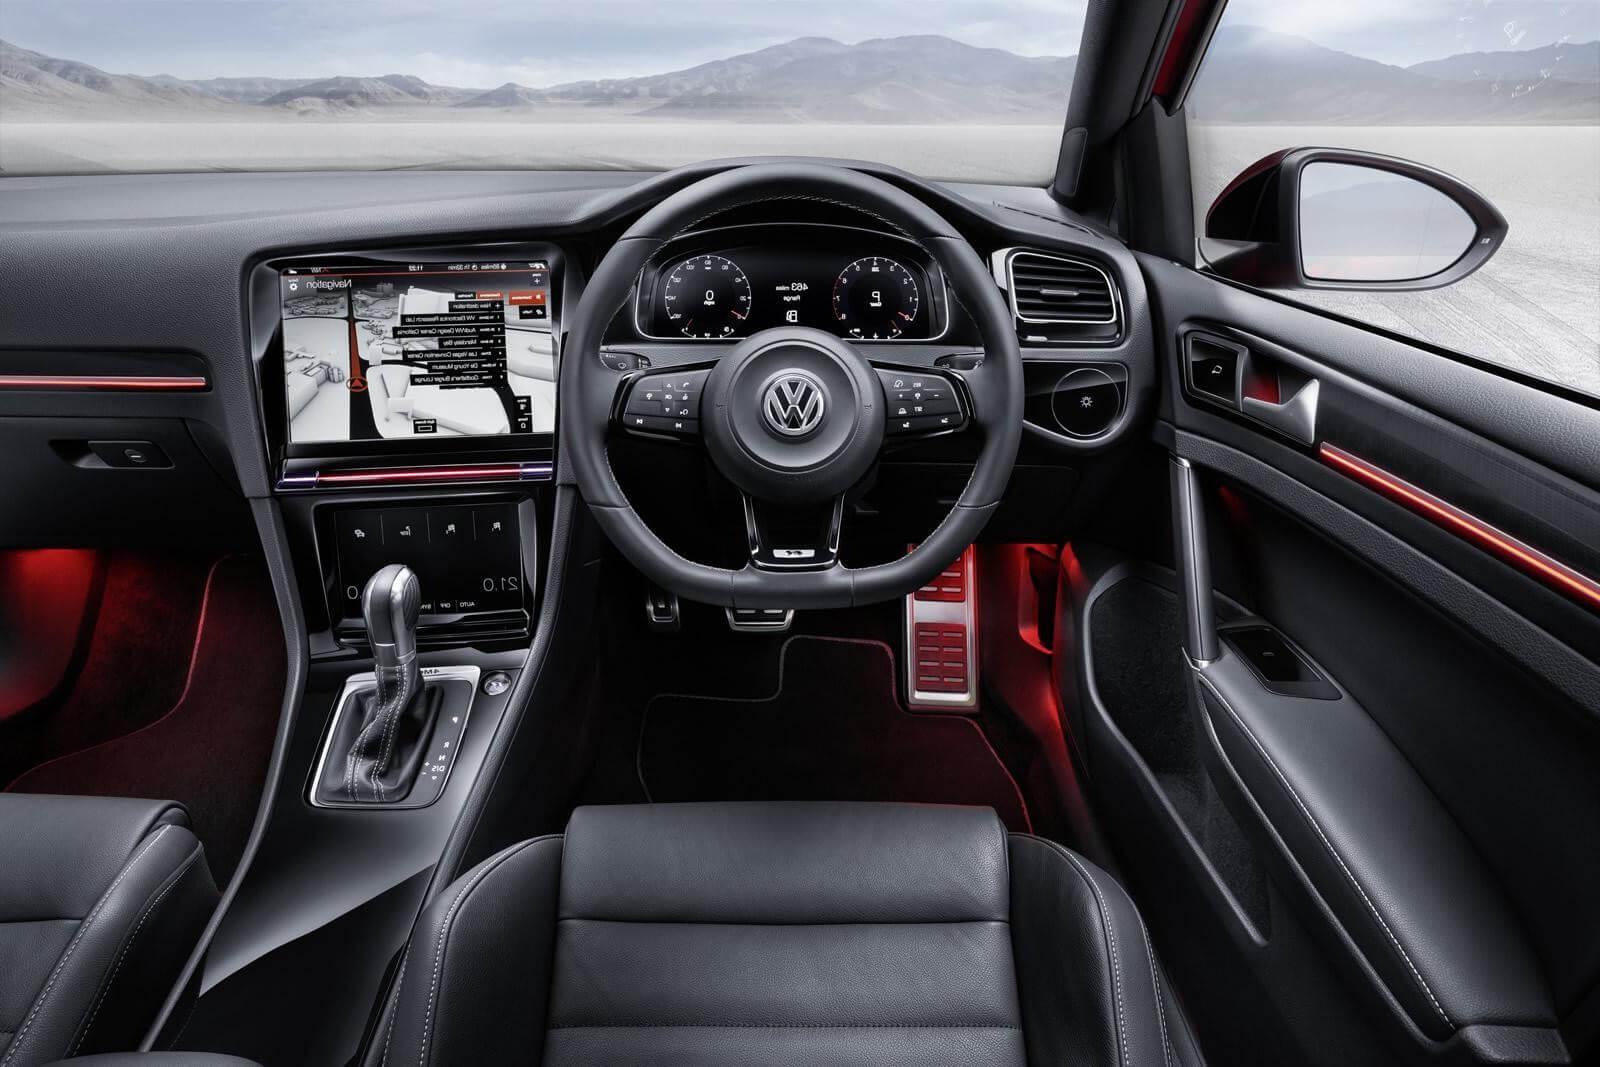 volkswagen-golf-interior